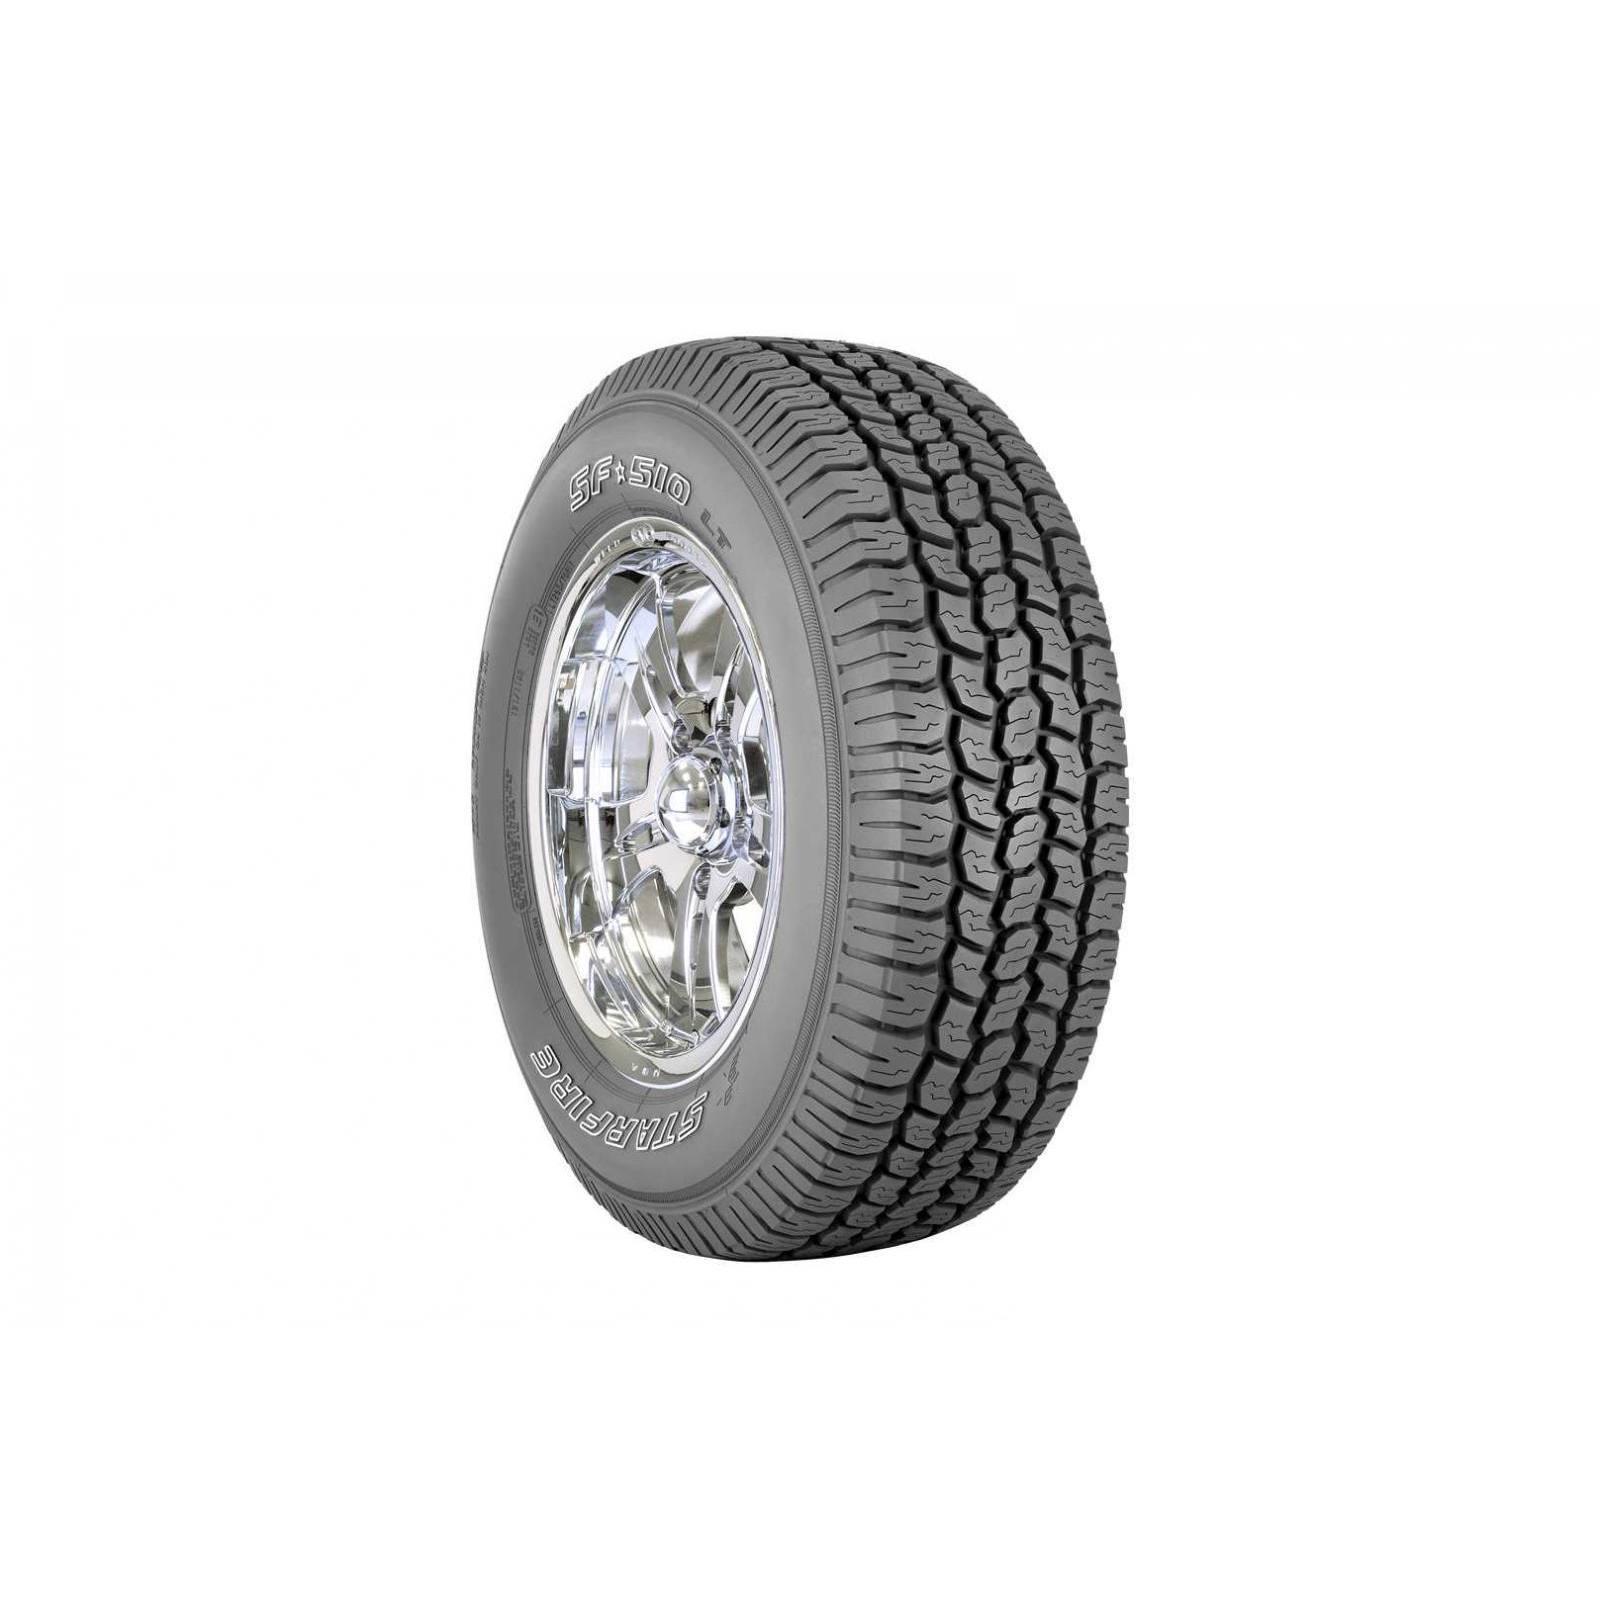 Starfire SF-510 LT All Season Tire - LT265/75R16 LRE/10 p...